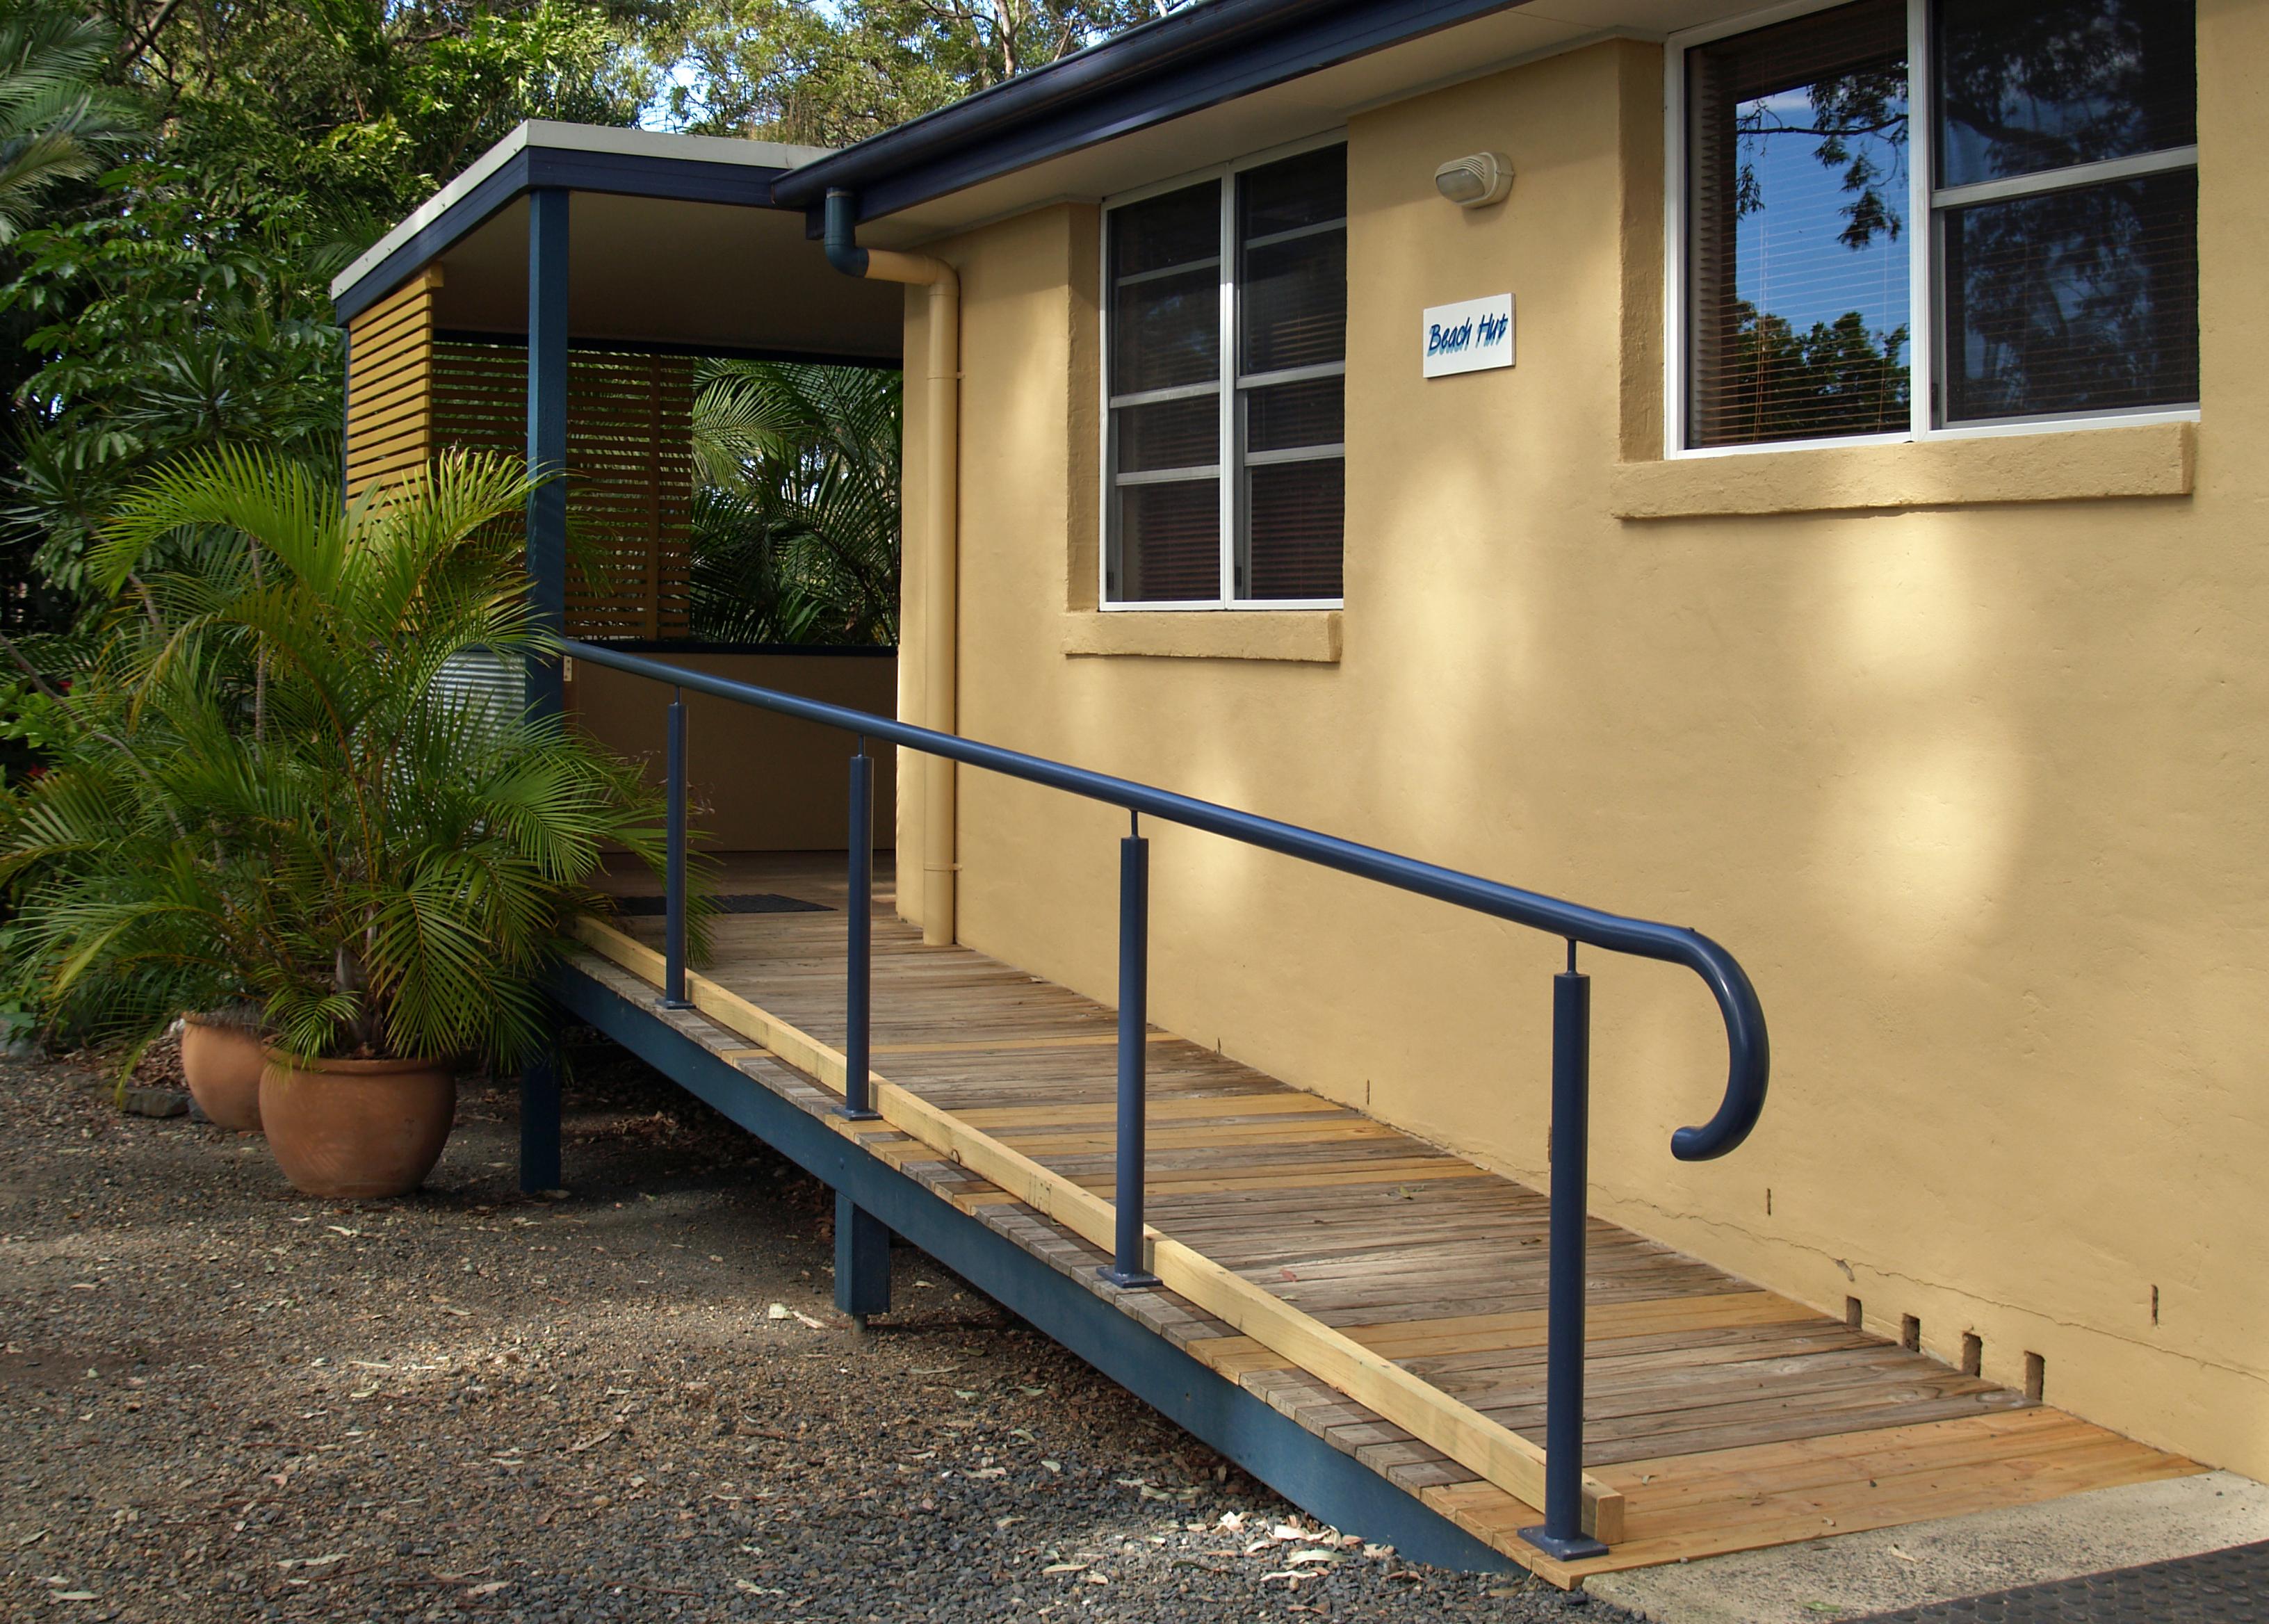 Pet friendly accommodation Woolgoolga & Coffs Harbour The Beach Hut Safety Beach Bungalows